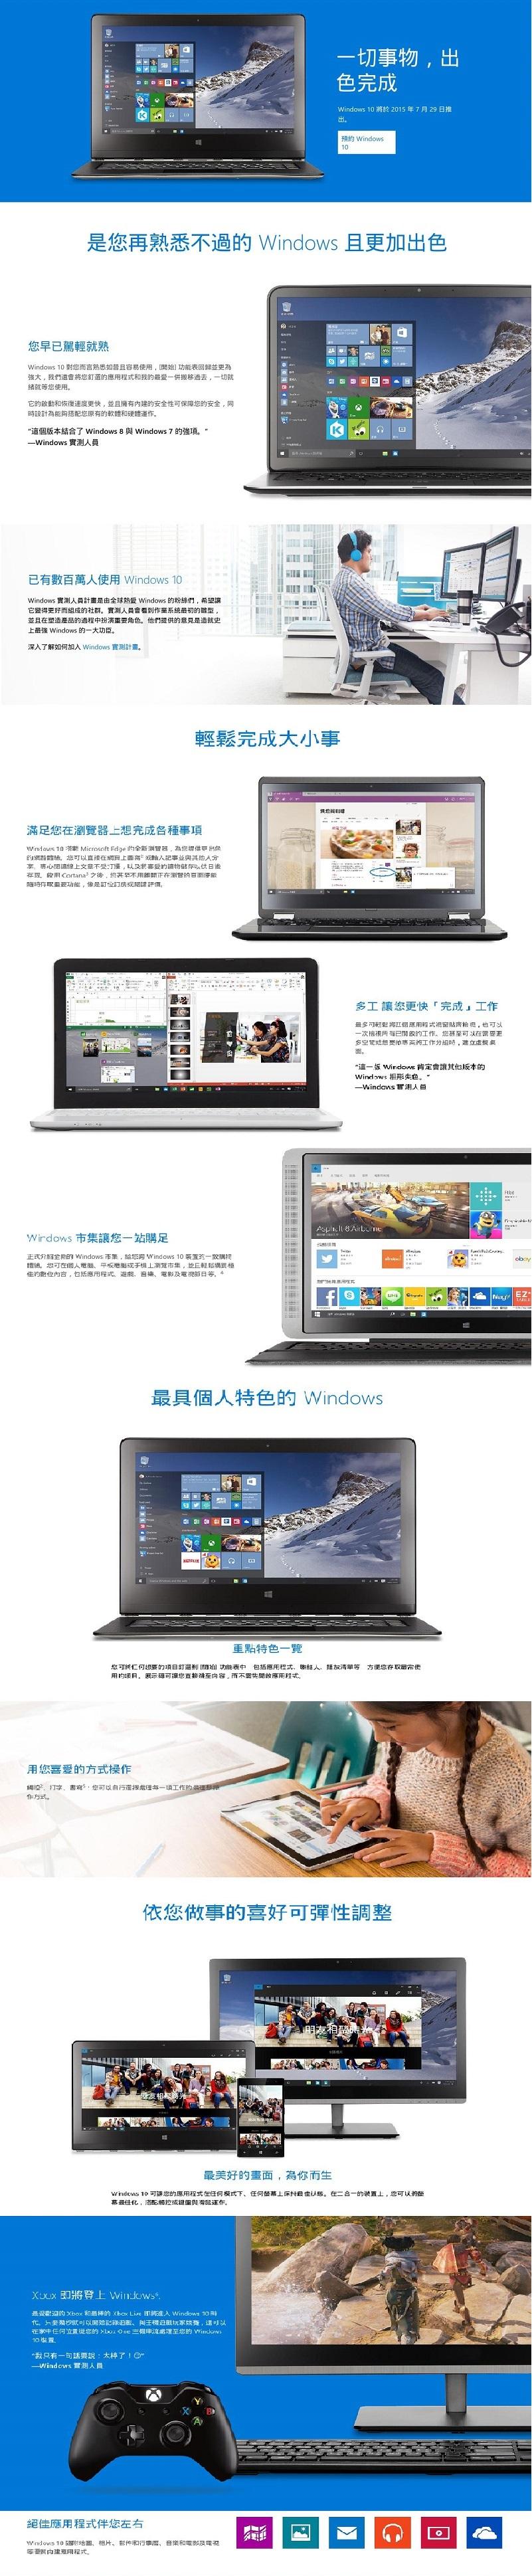 windows 10 專業 中文 版 64 位 元 隨機 版